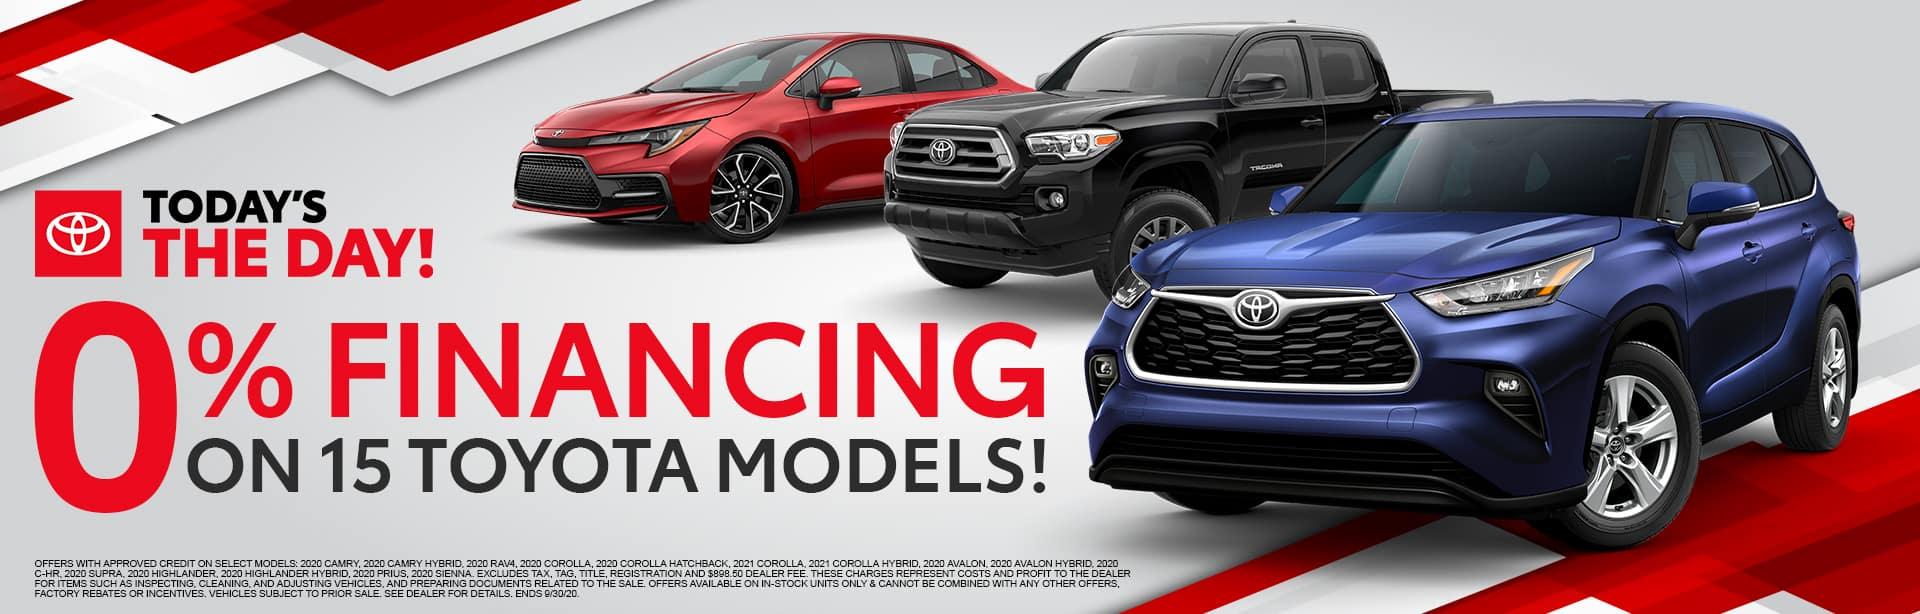 0% Financing on 15 Toyota Models at Bev Smith Toyota!